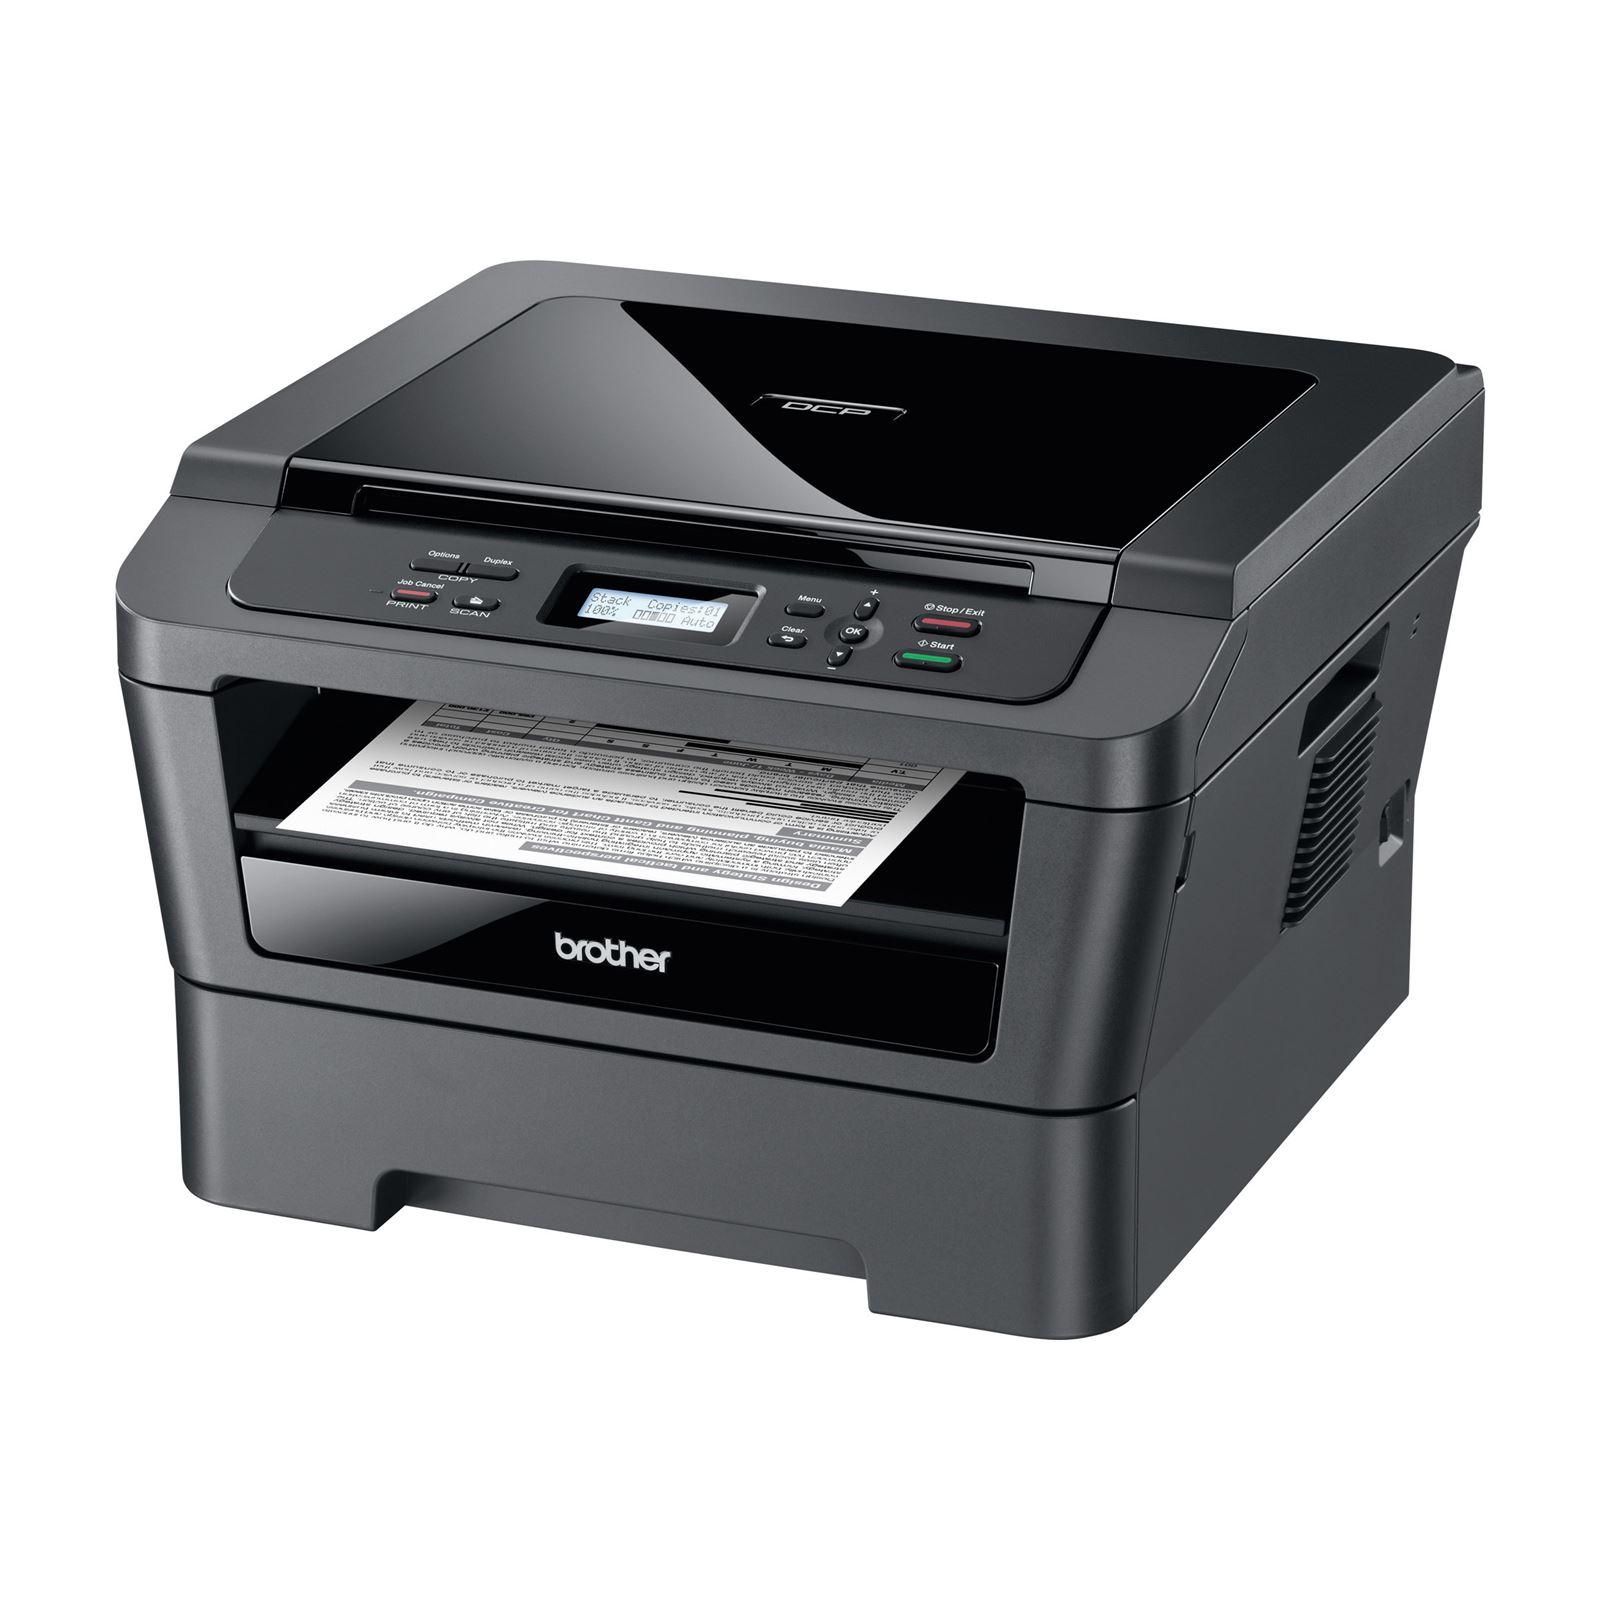 Принтер Brother DCP-7070DW